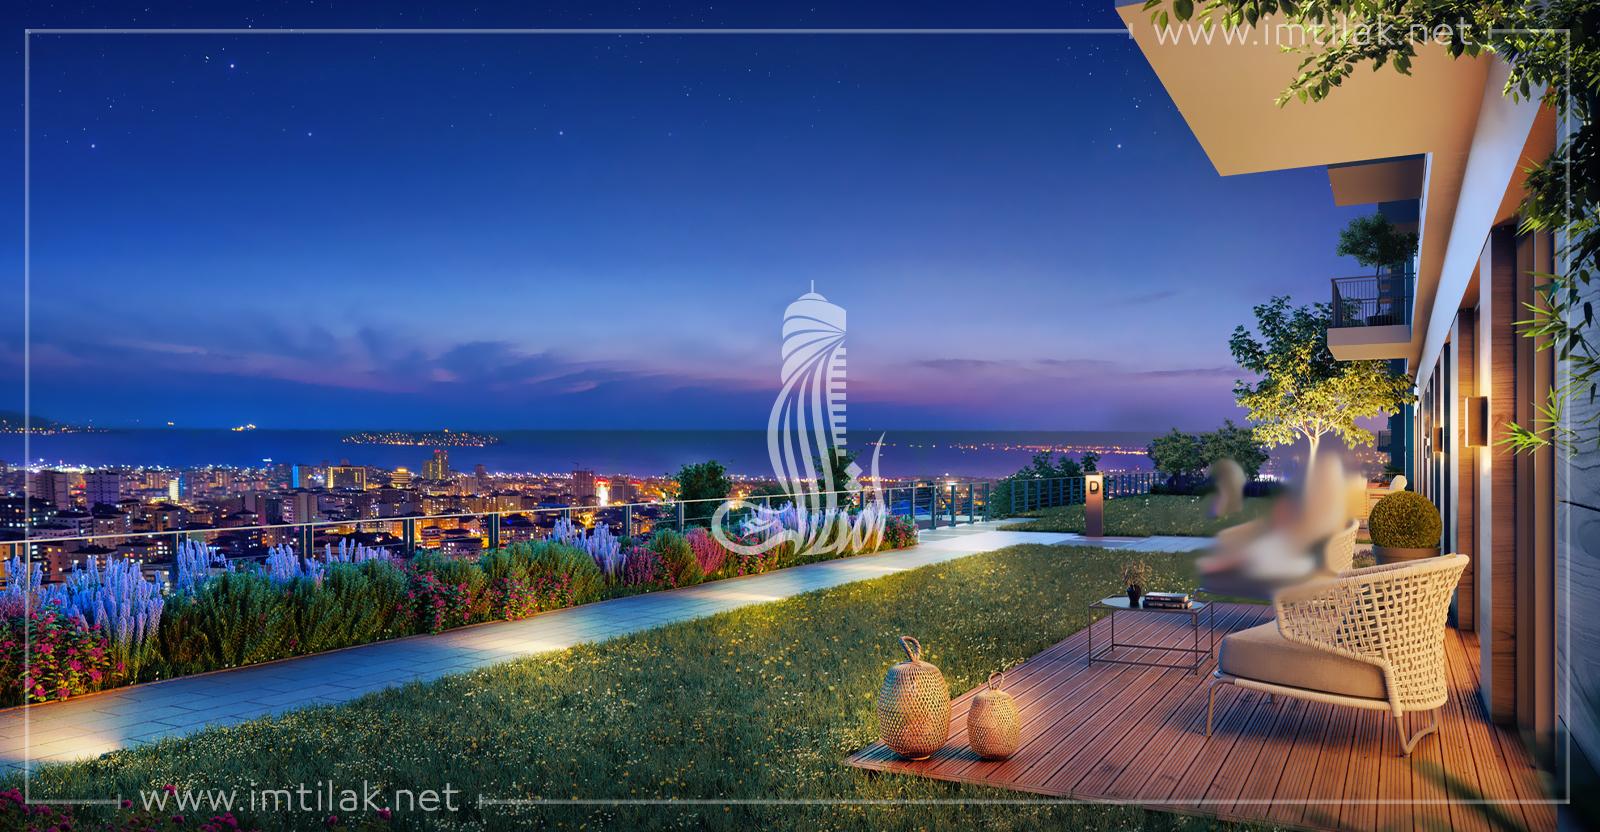 پروژه ییشیل ماوی  ۴۰۶ - IMT